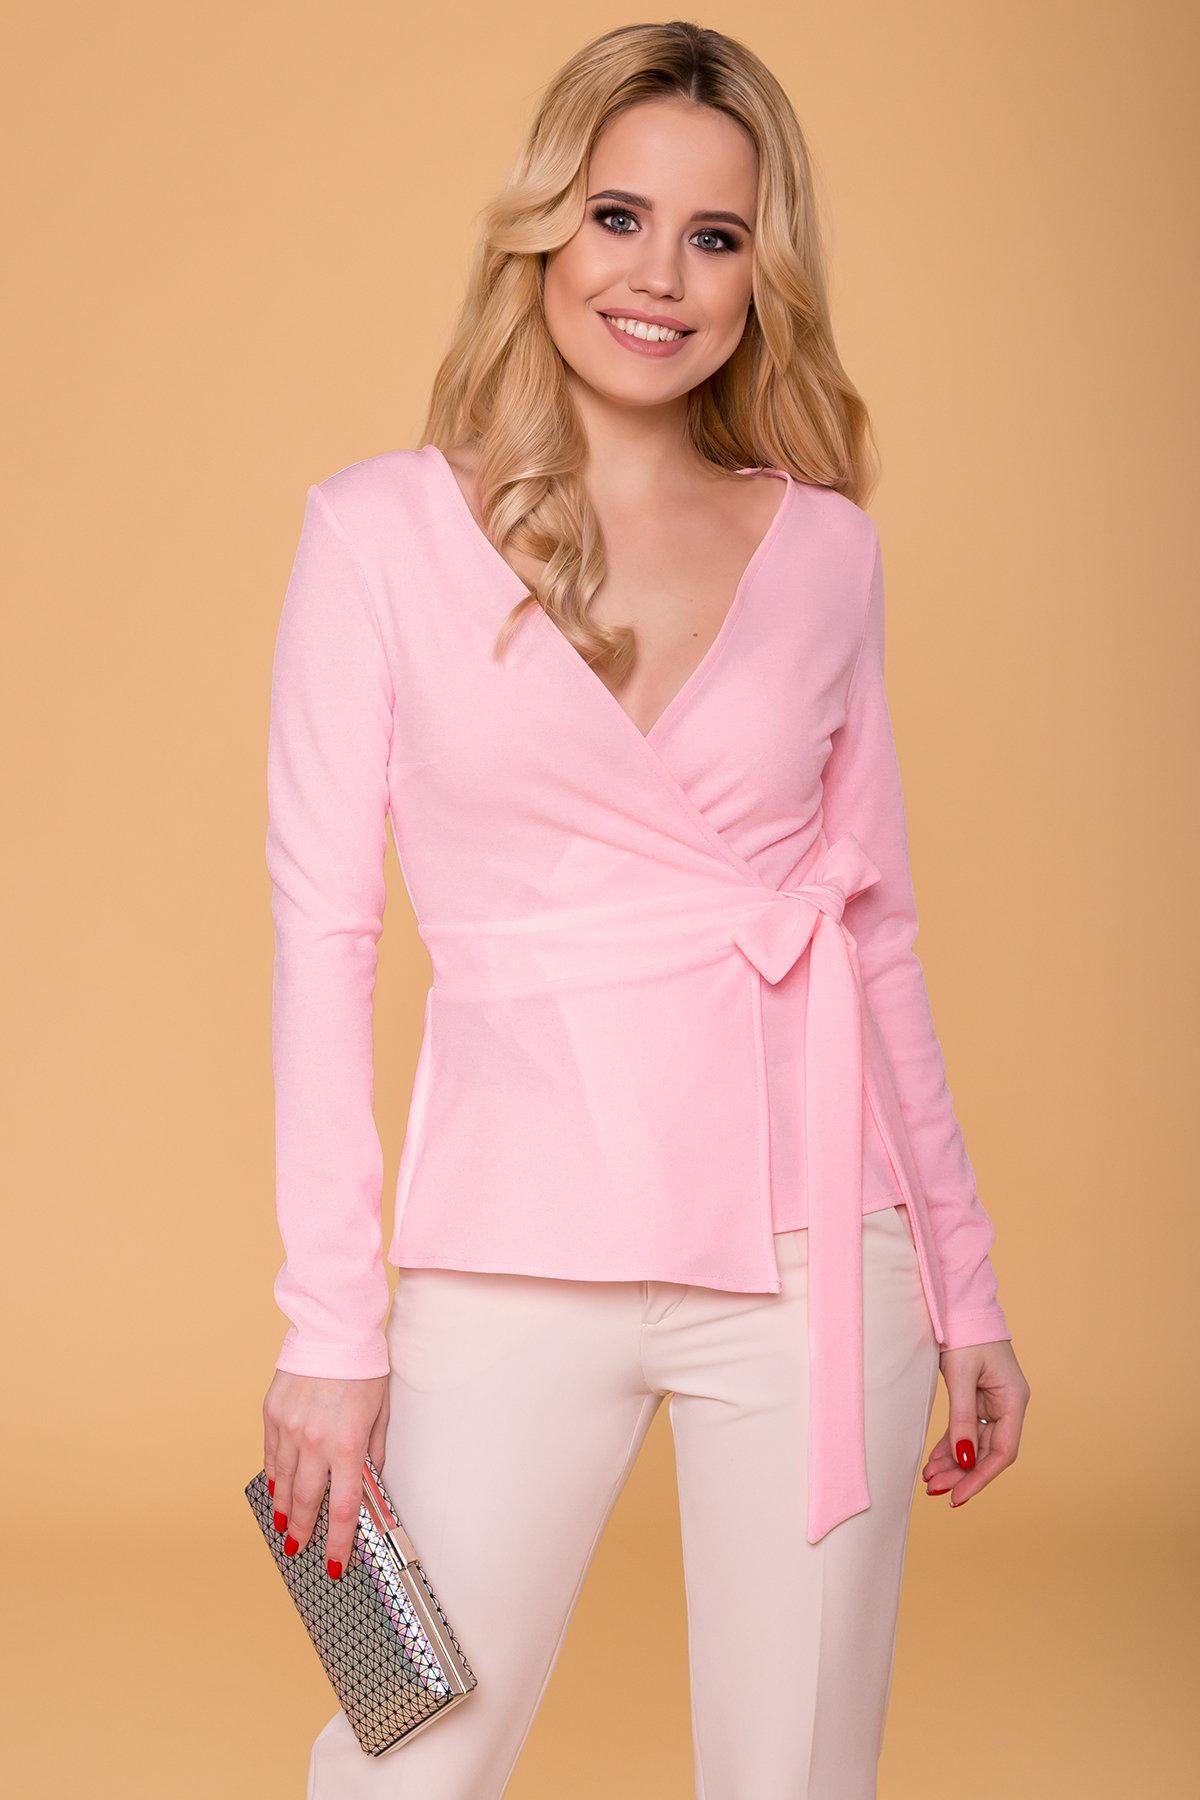 Блуза  Марсо 6432 АРТ. 41433 Цвет: Розовый - фото 3, интернет магазин tm-modus.ru